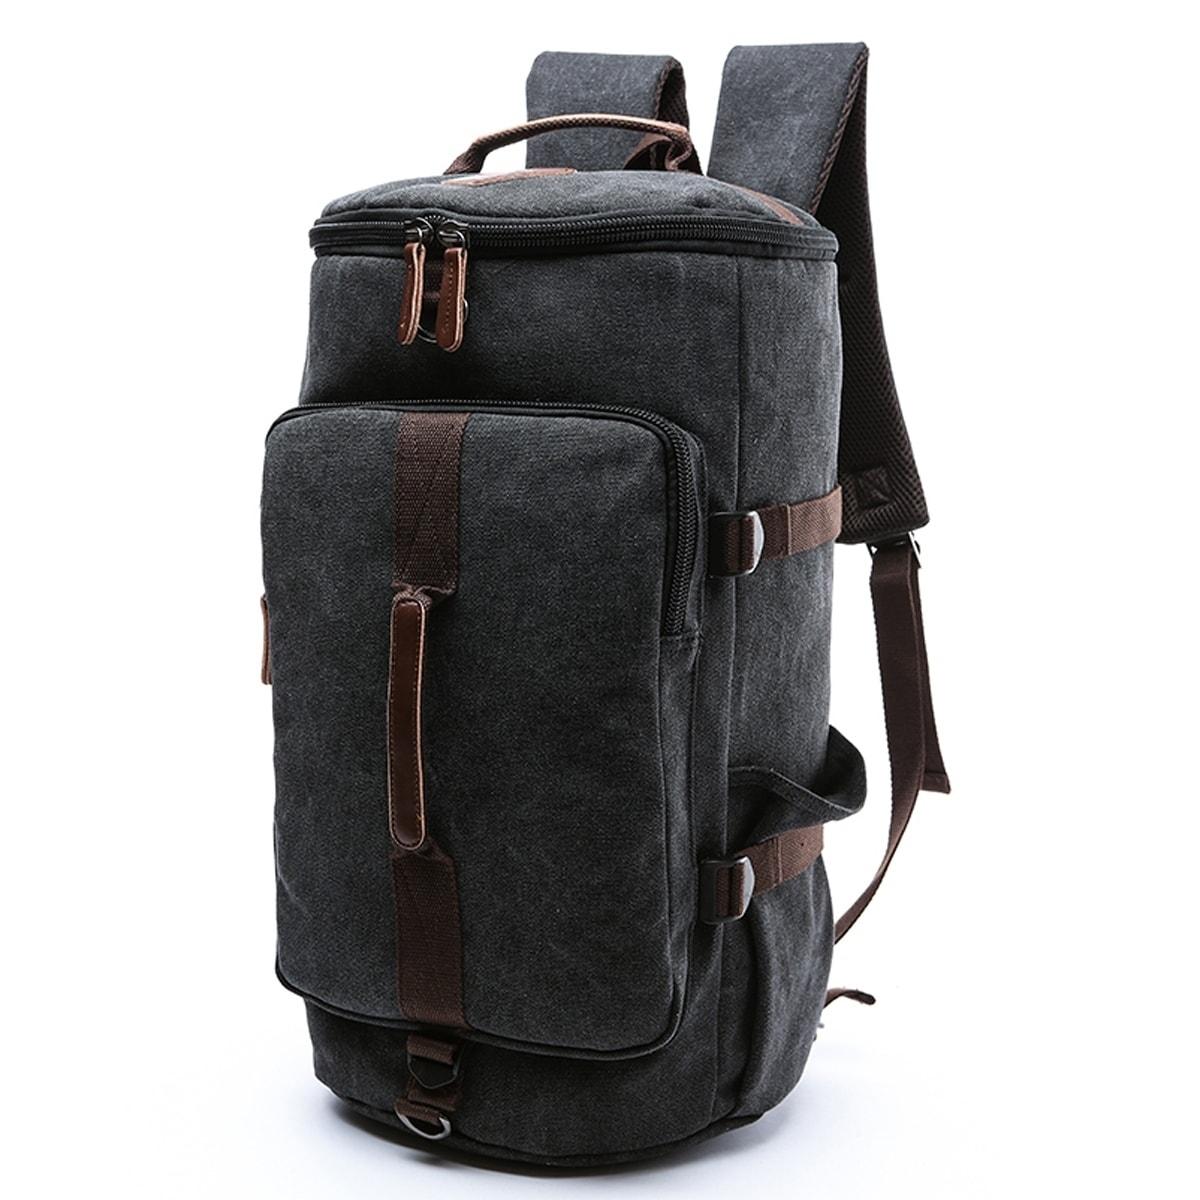 33beecdec Dasein Vintage Unisex Canvas Multi-purpose Bag for Travel or Hiking (Black)